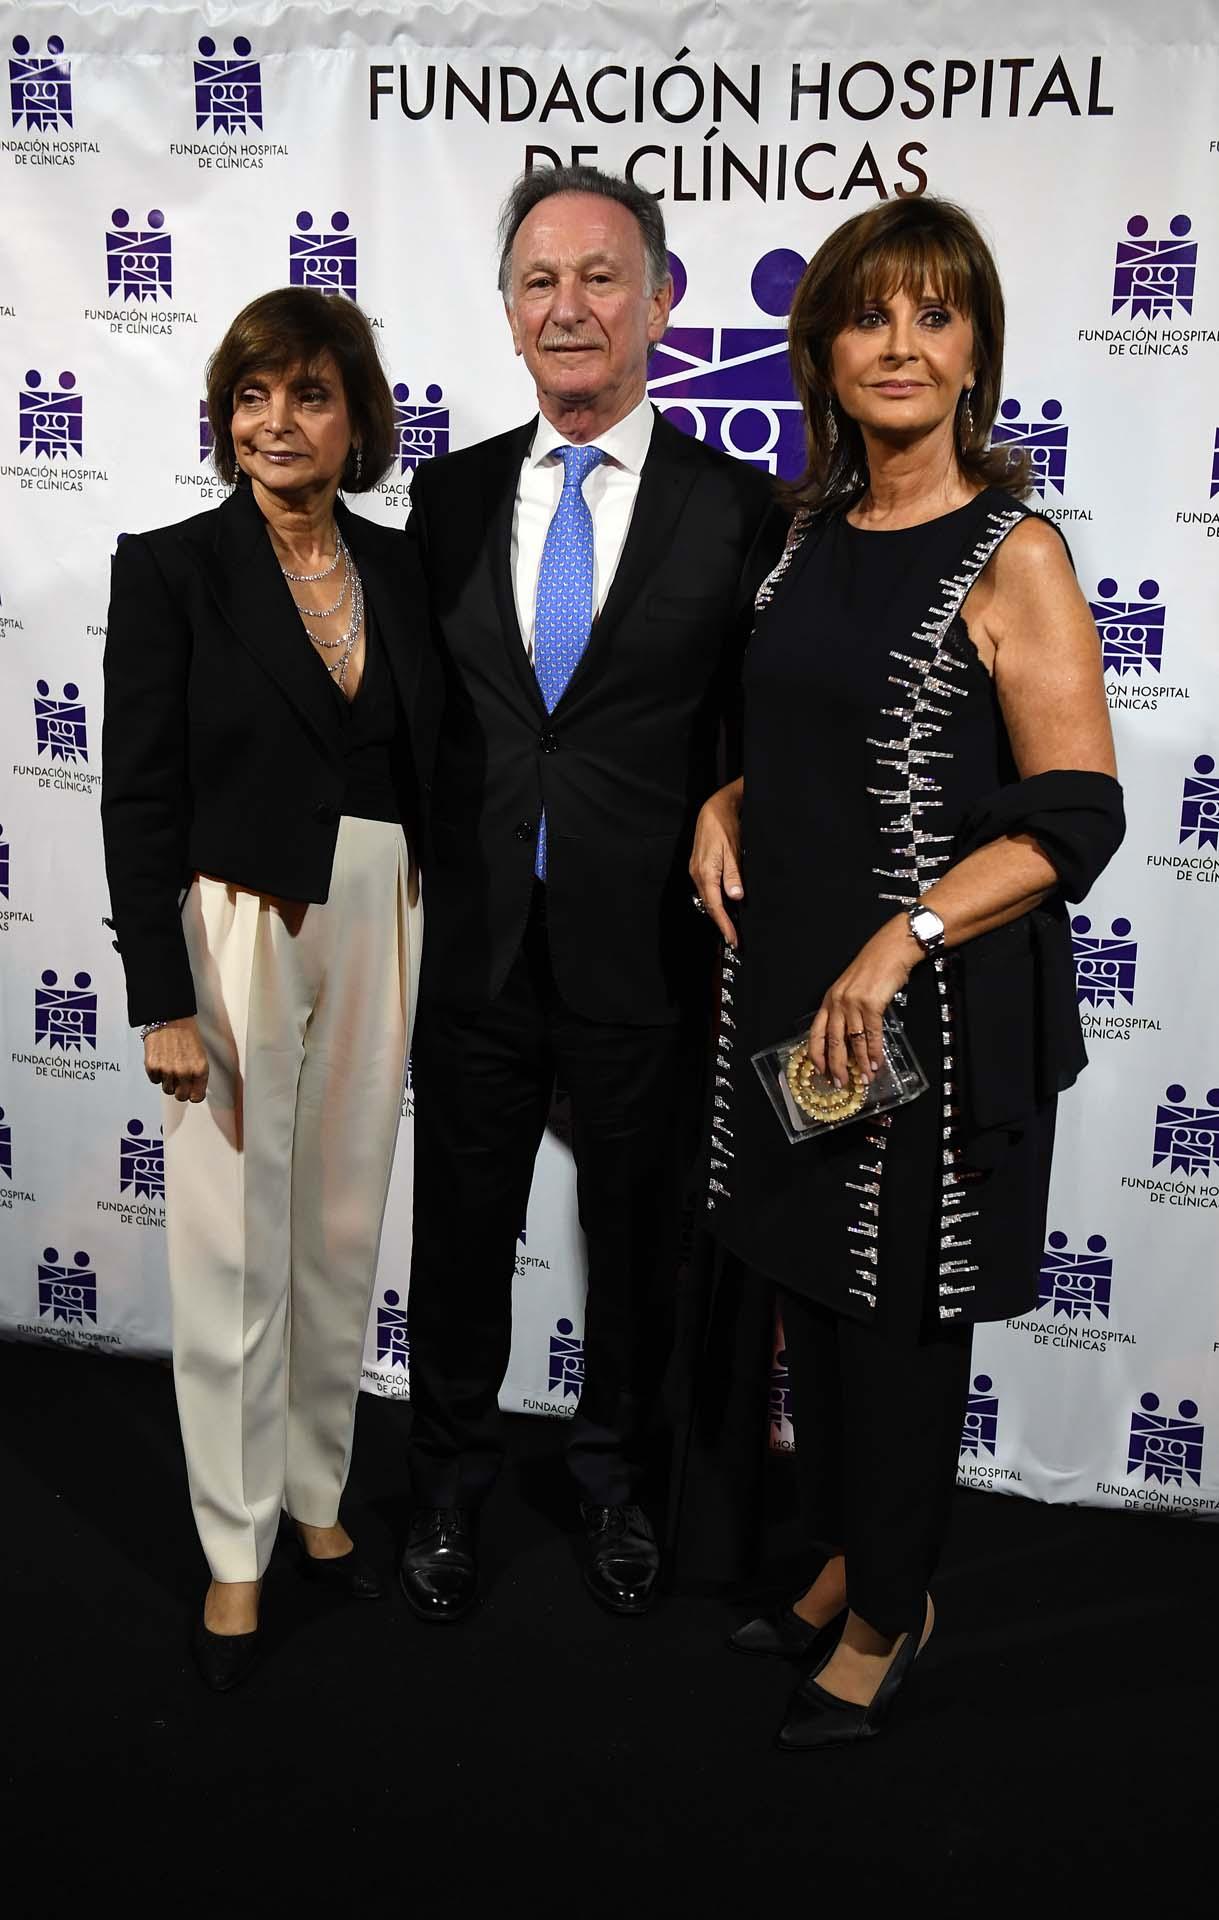 Claudia Stad junto a Gustavo Weiss y su mujer Myriam Levi